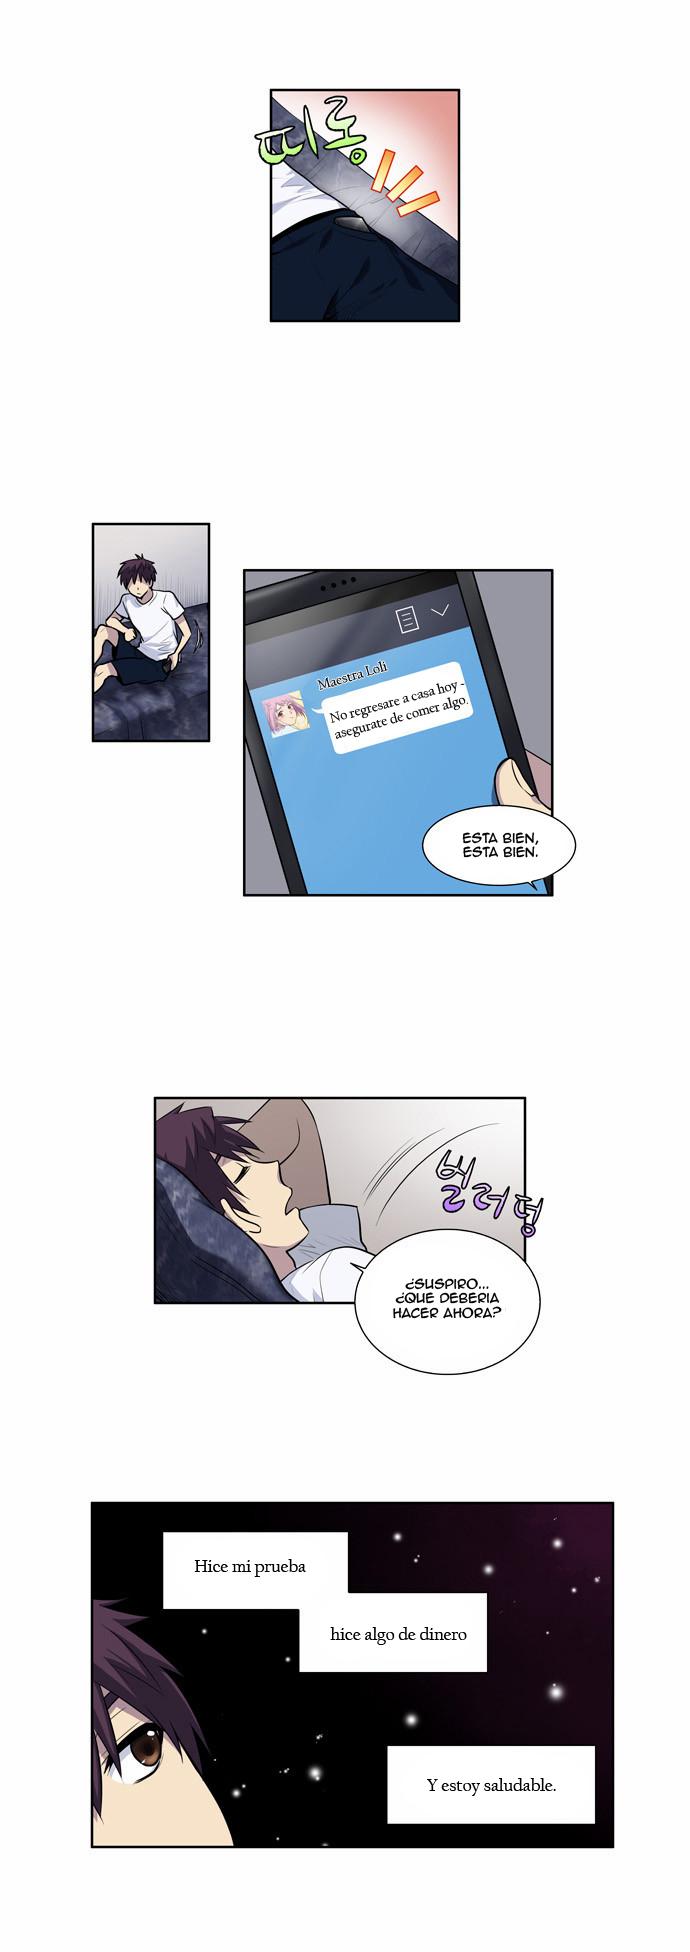 http://c5.ninemanga.com/es_manga/61/1725/419329/e8f51c2698fbcced3bfe59f41b257292.jpg Page 4